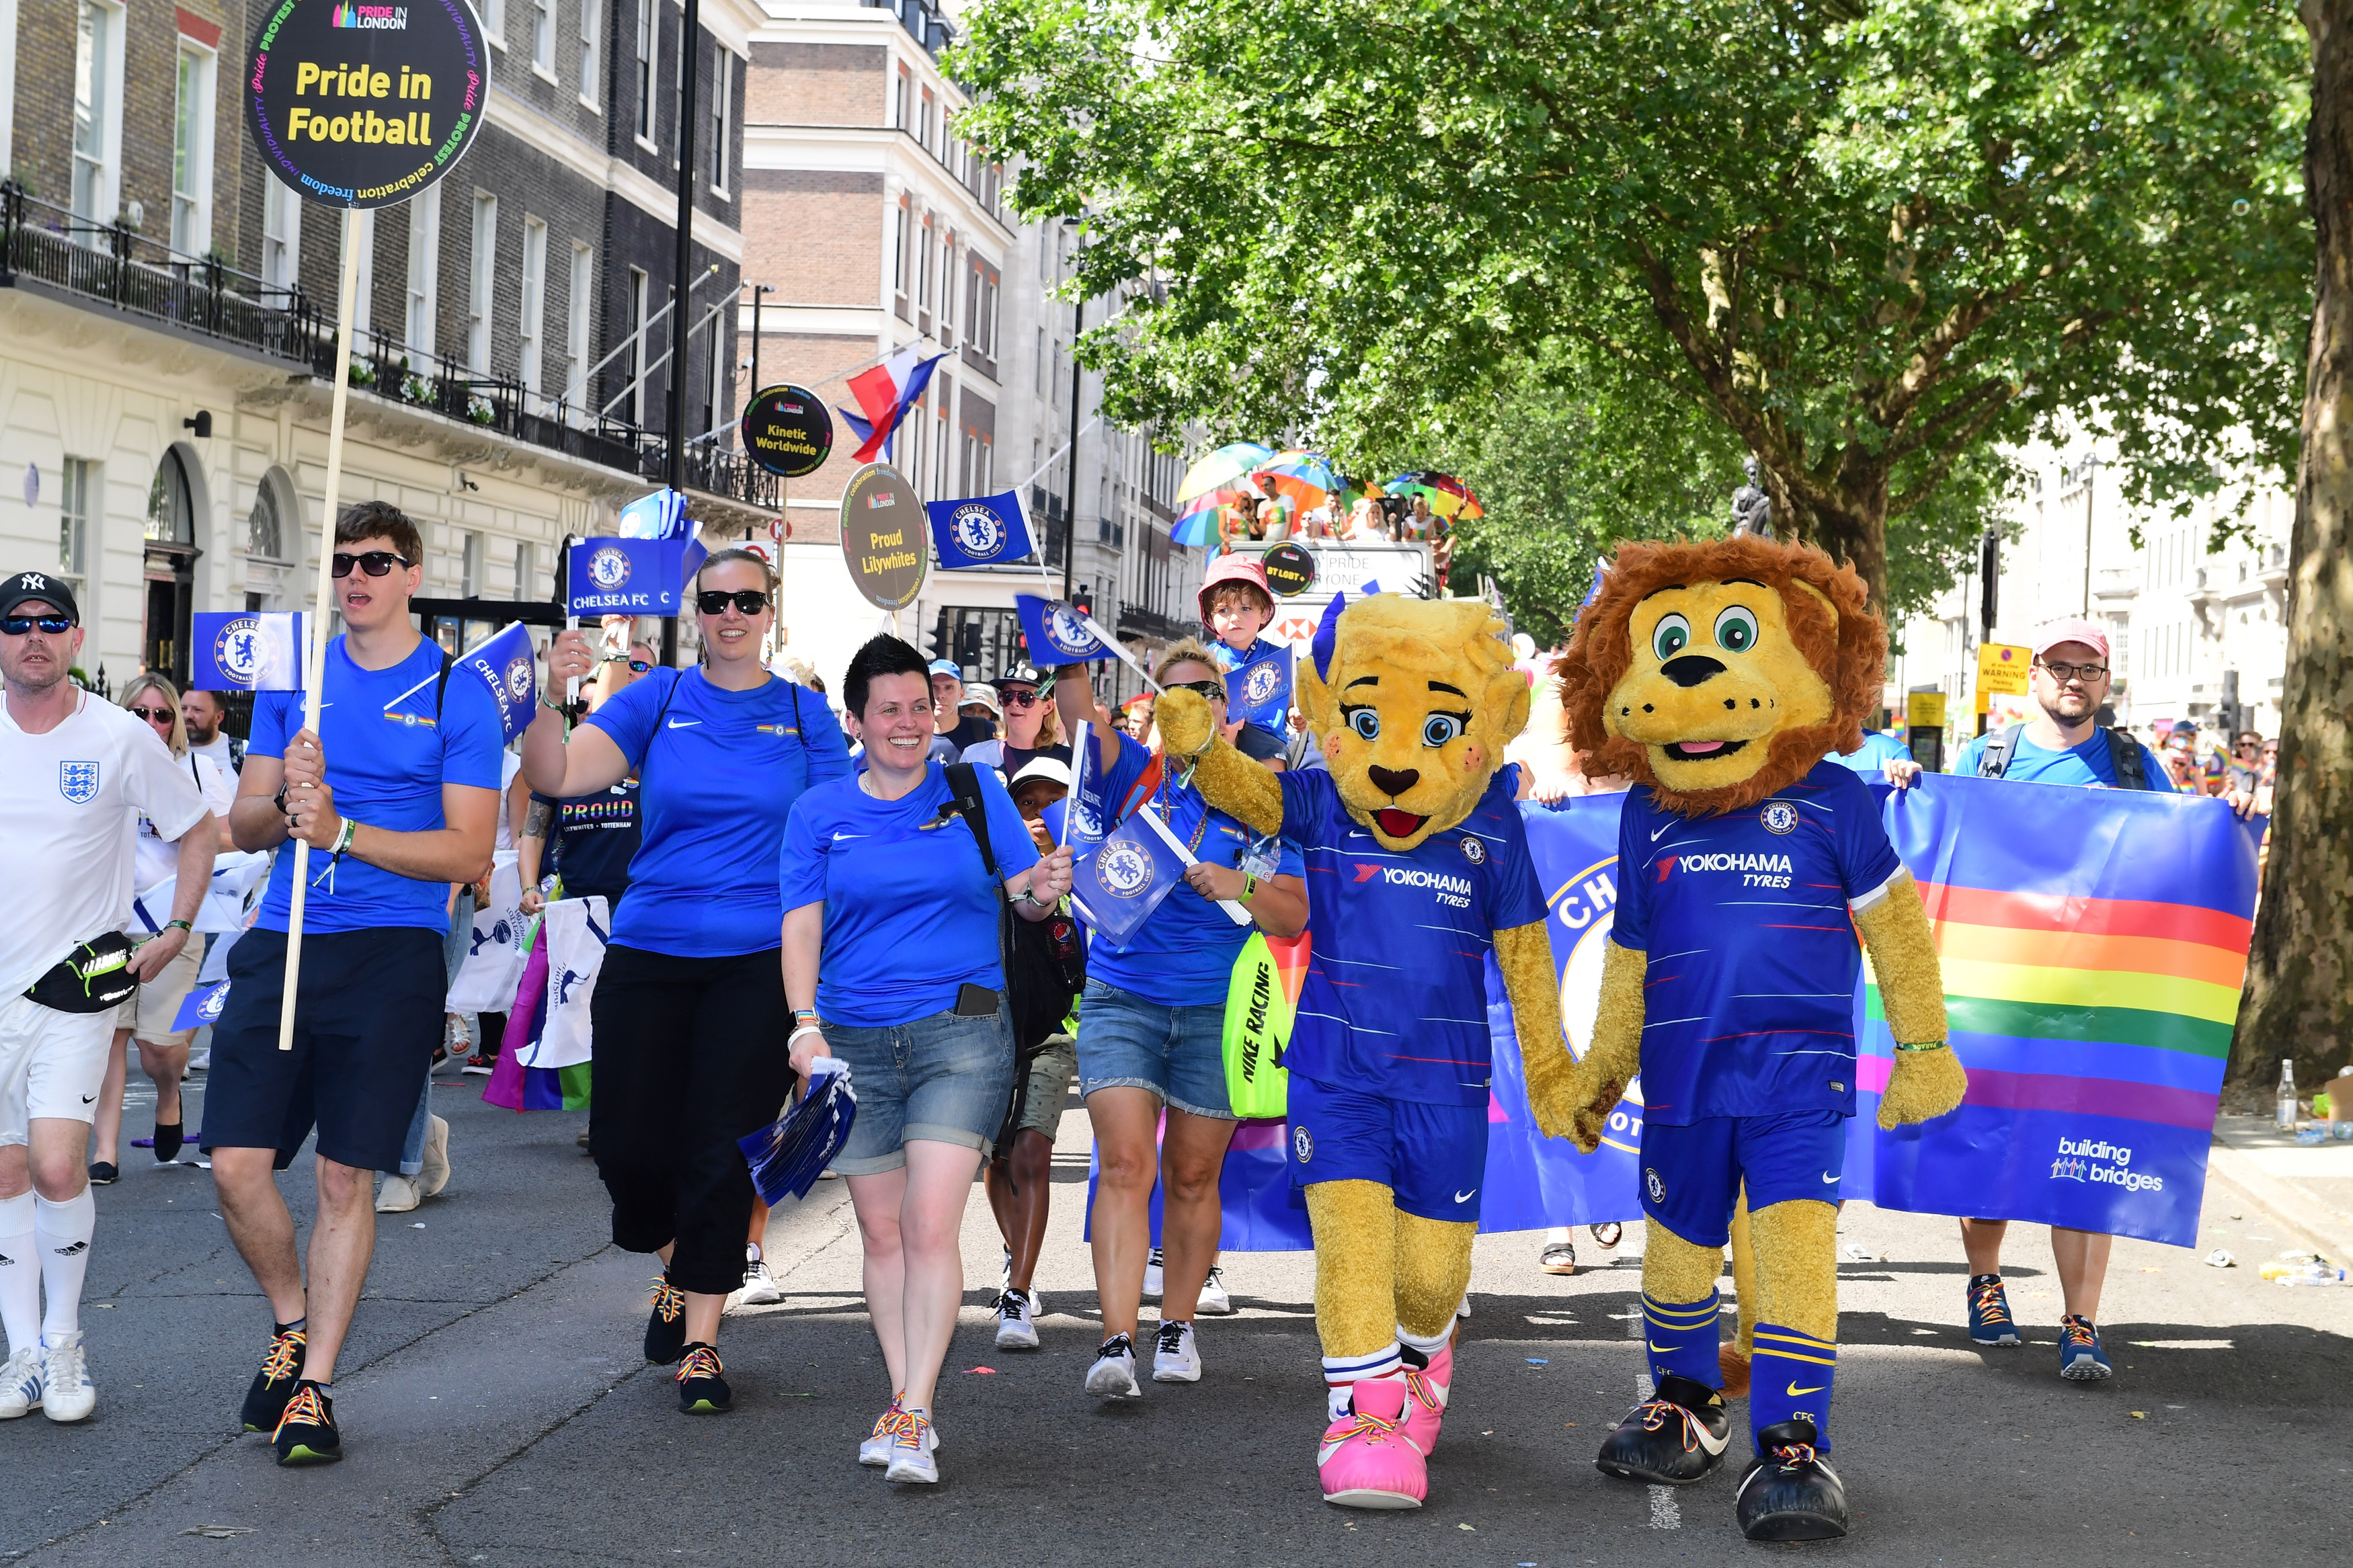 Chelsea Foundation - Pride In London 2018